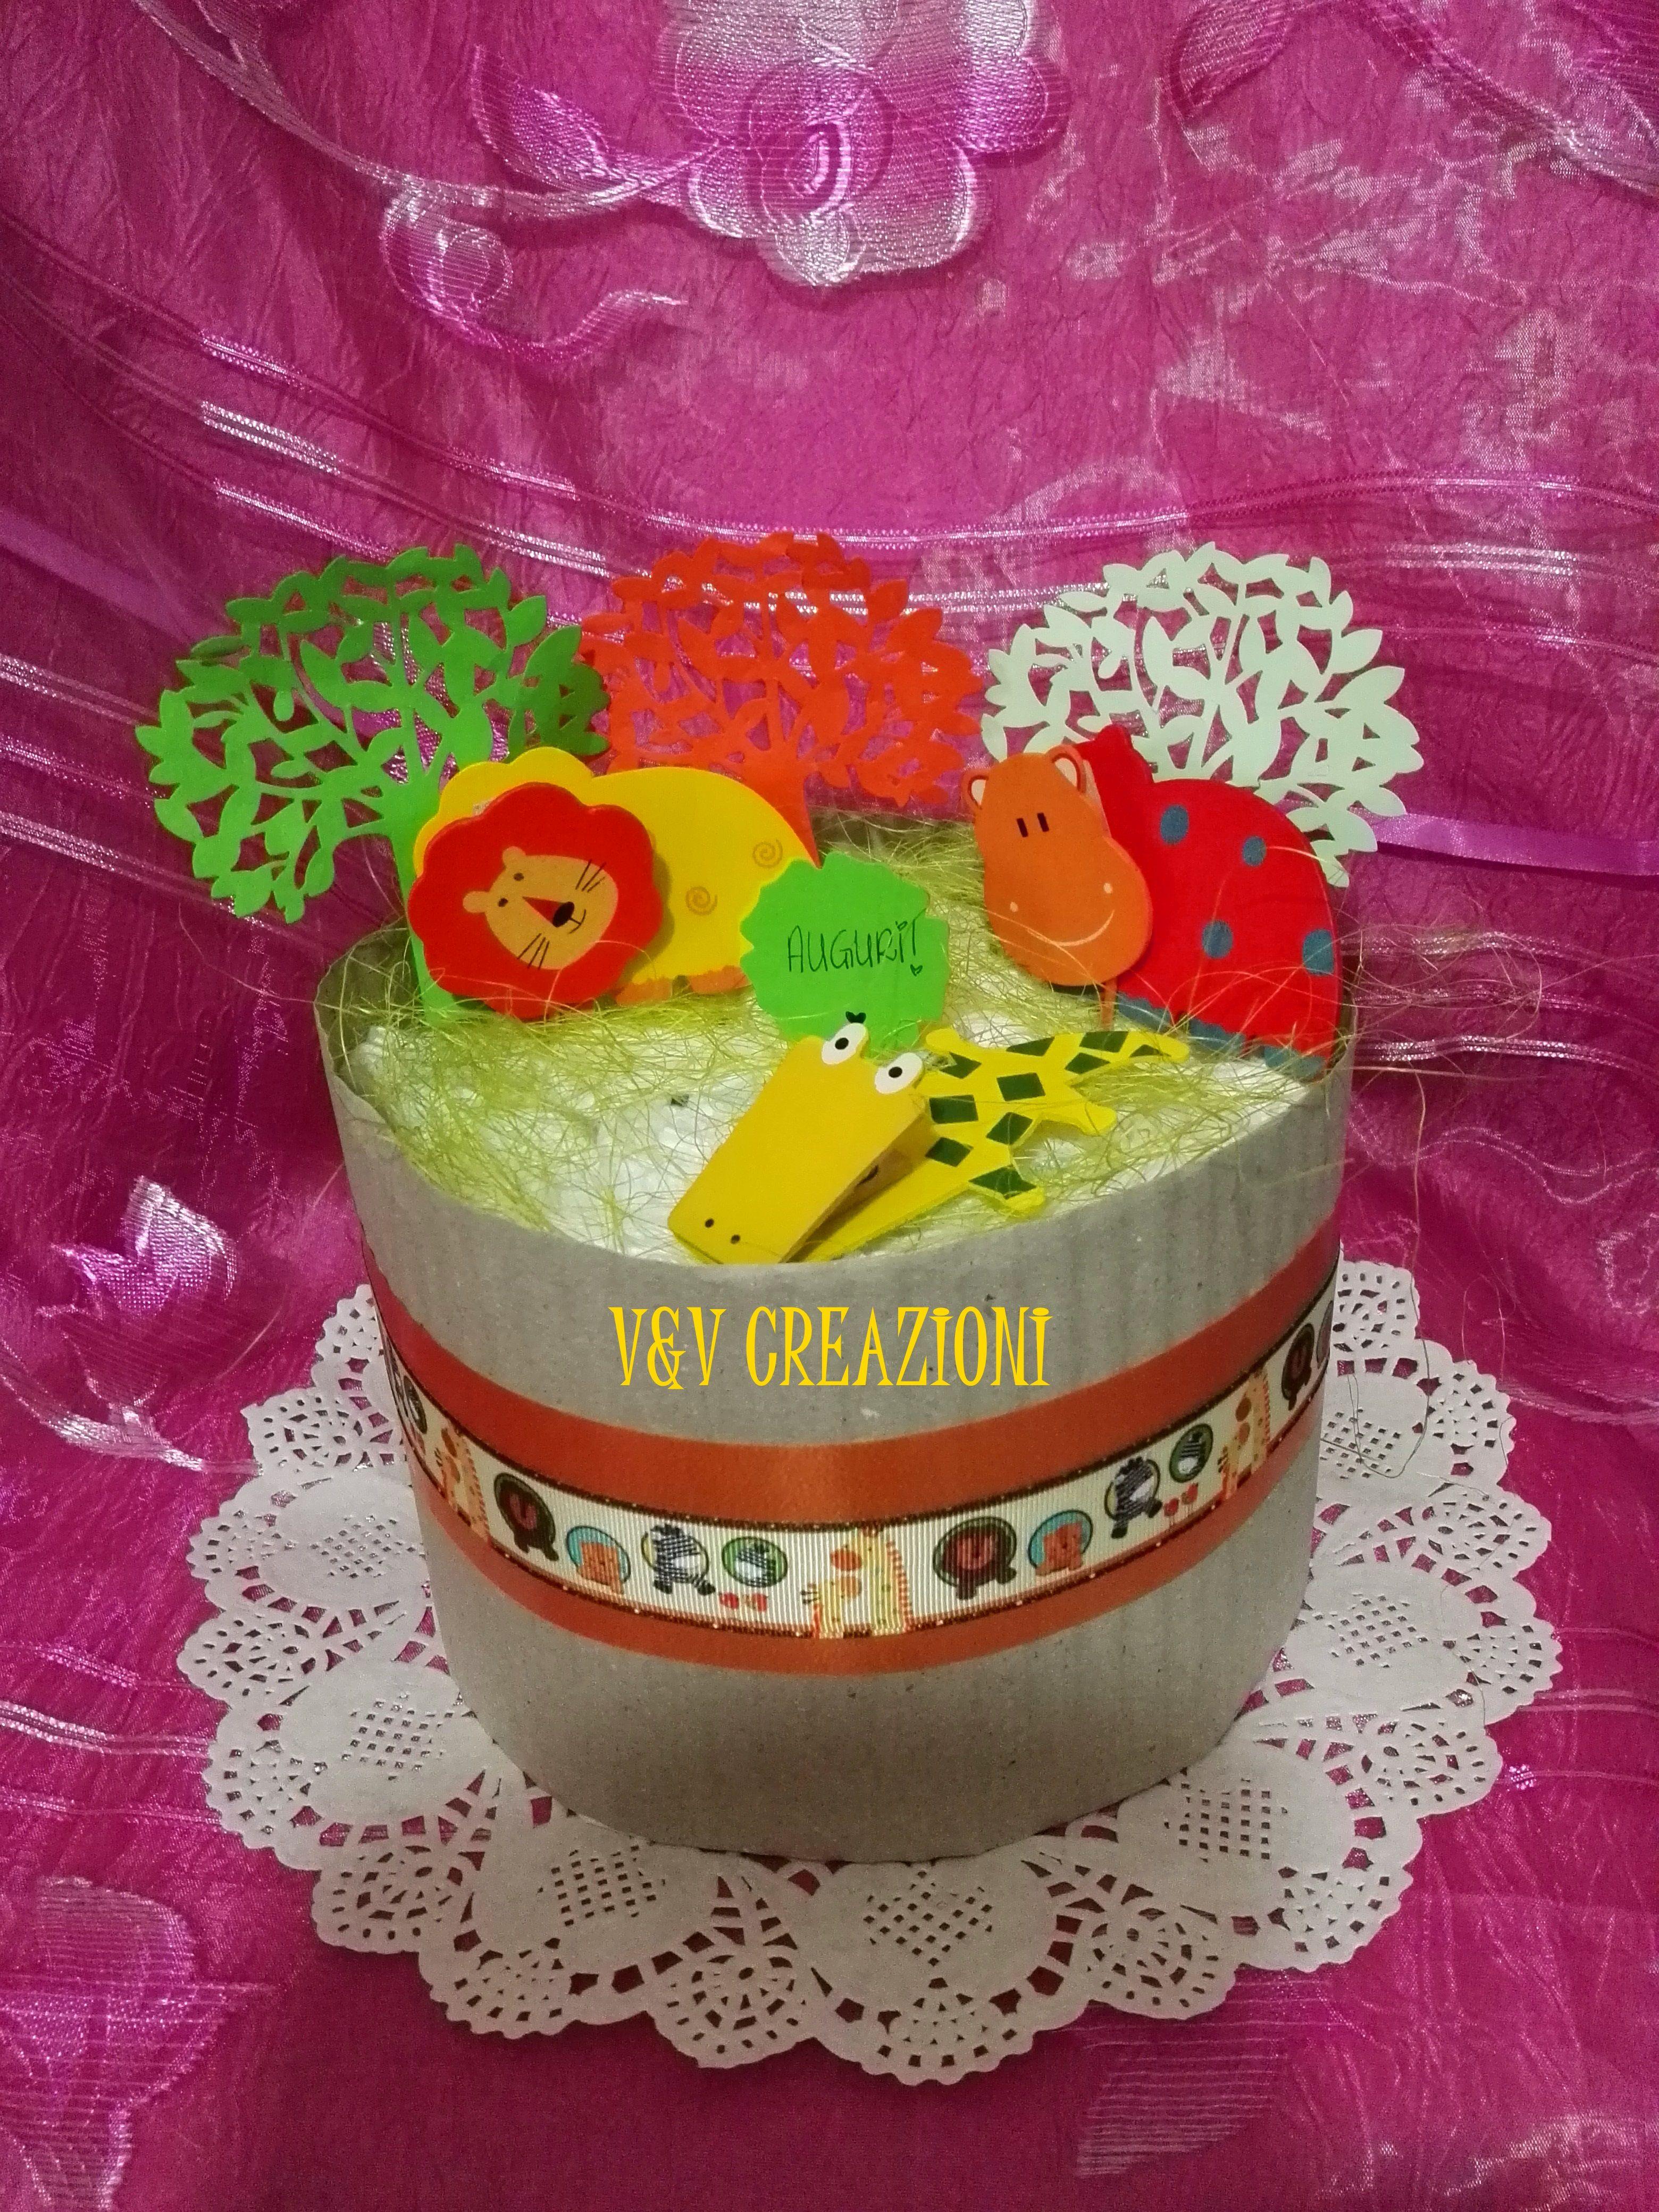 V&V CREAZIONI - L'atelier dei pannolini* Dal 2012,serietà, professionalità e cortesia accompagnano le nostre TORTE DI PANNOLINI♥ Solo prodotti unici e di classe Ci trovate a Sestu ed Elmas (CA) - Fb:https://www.facebook.com/VeVCreazioni * Instagram: www.instagram.com... * Diaper cakes, Torta de panales, baby shower, newborn ♥